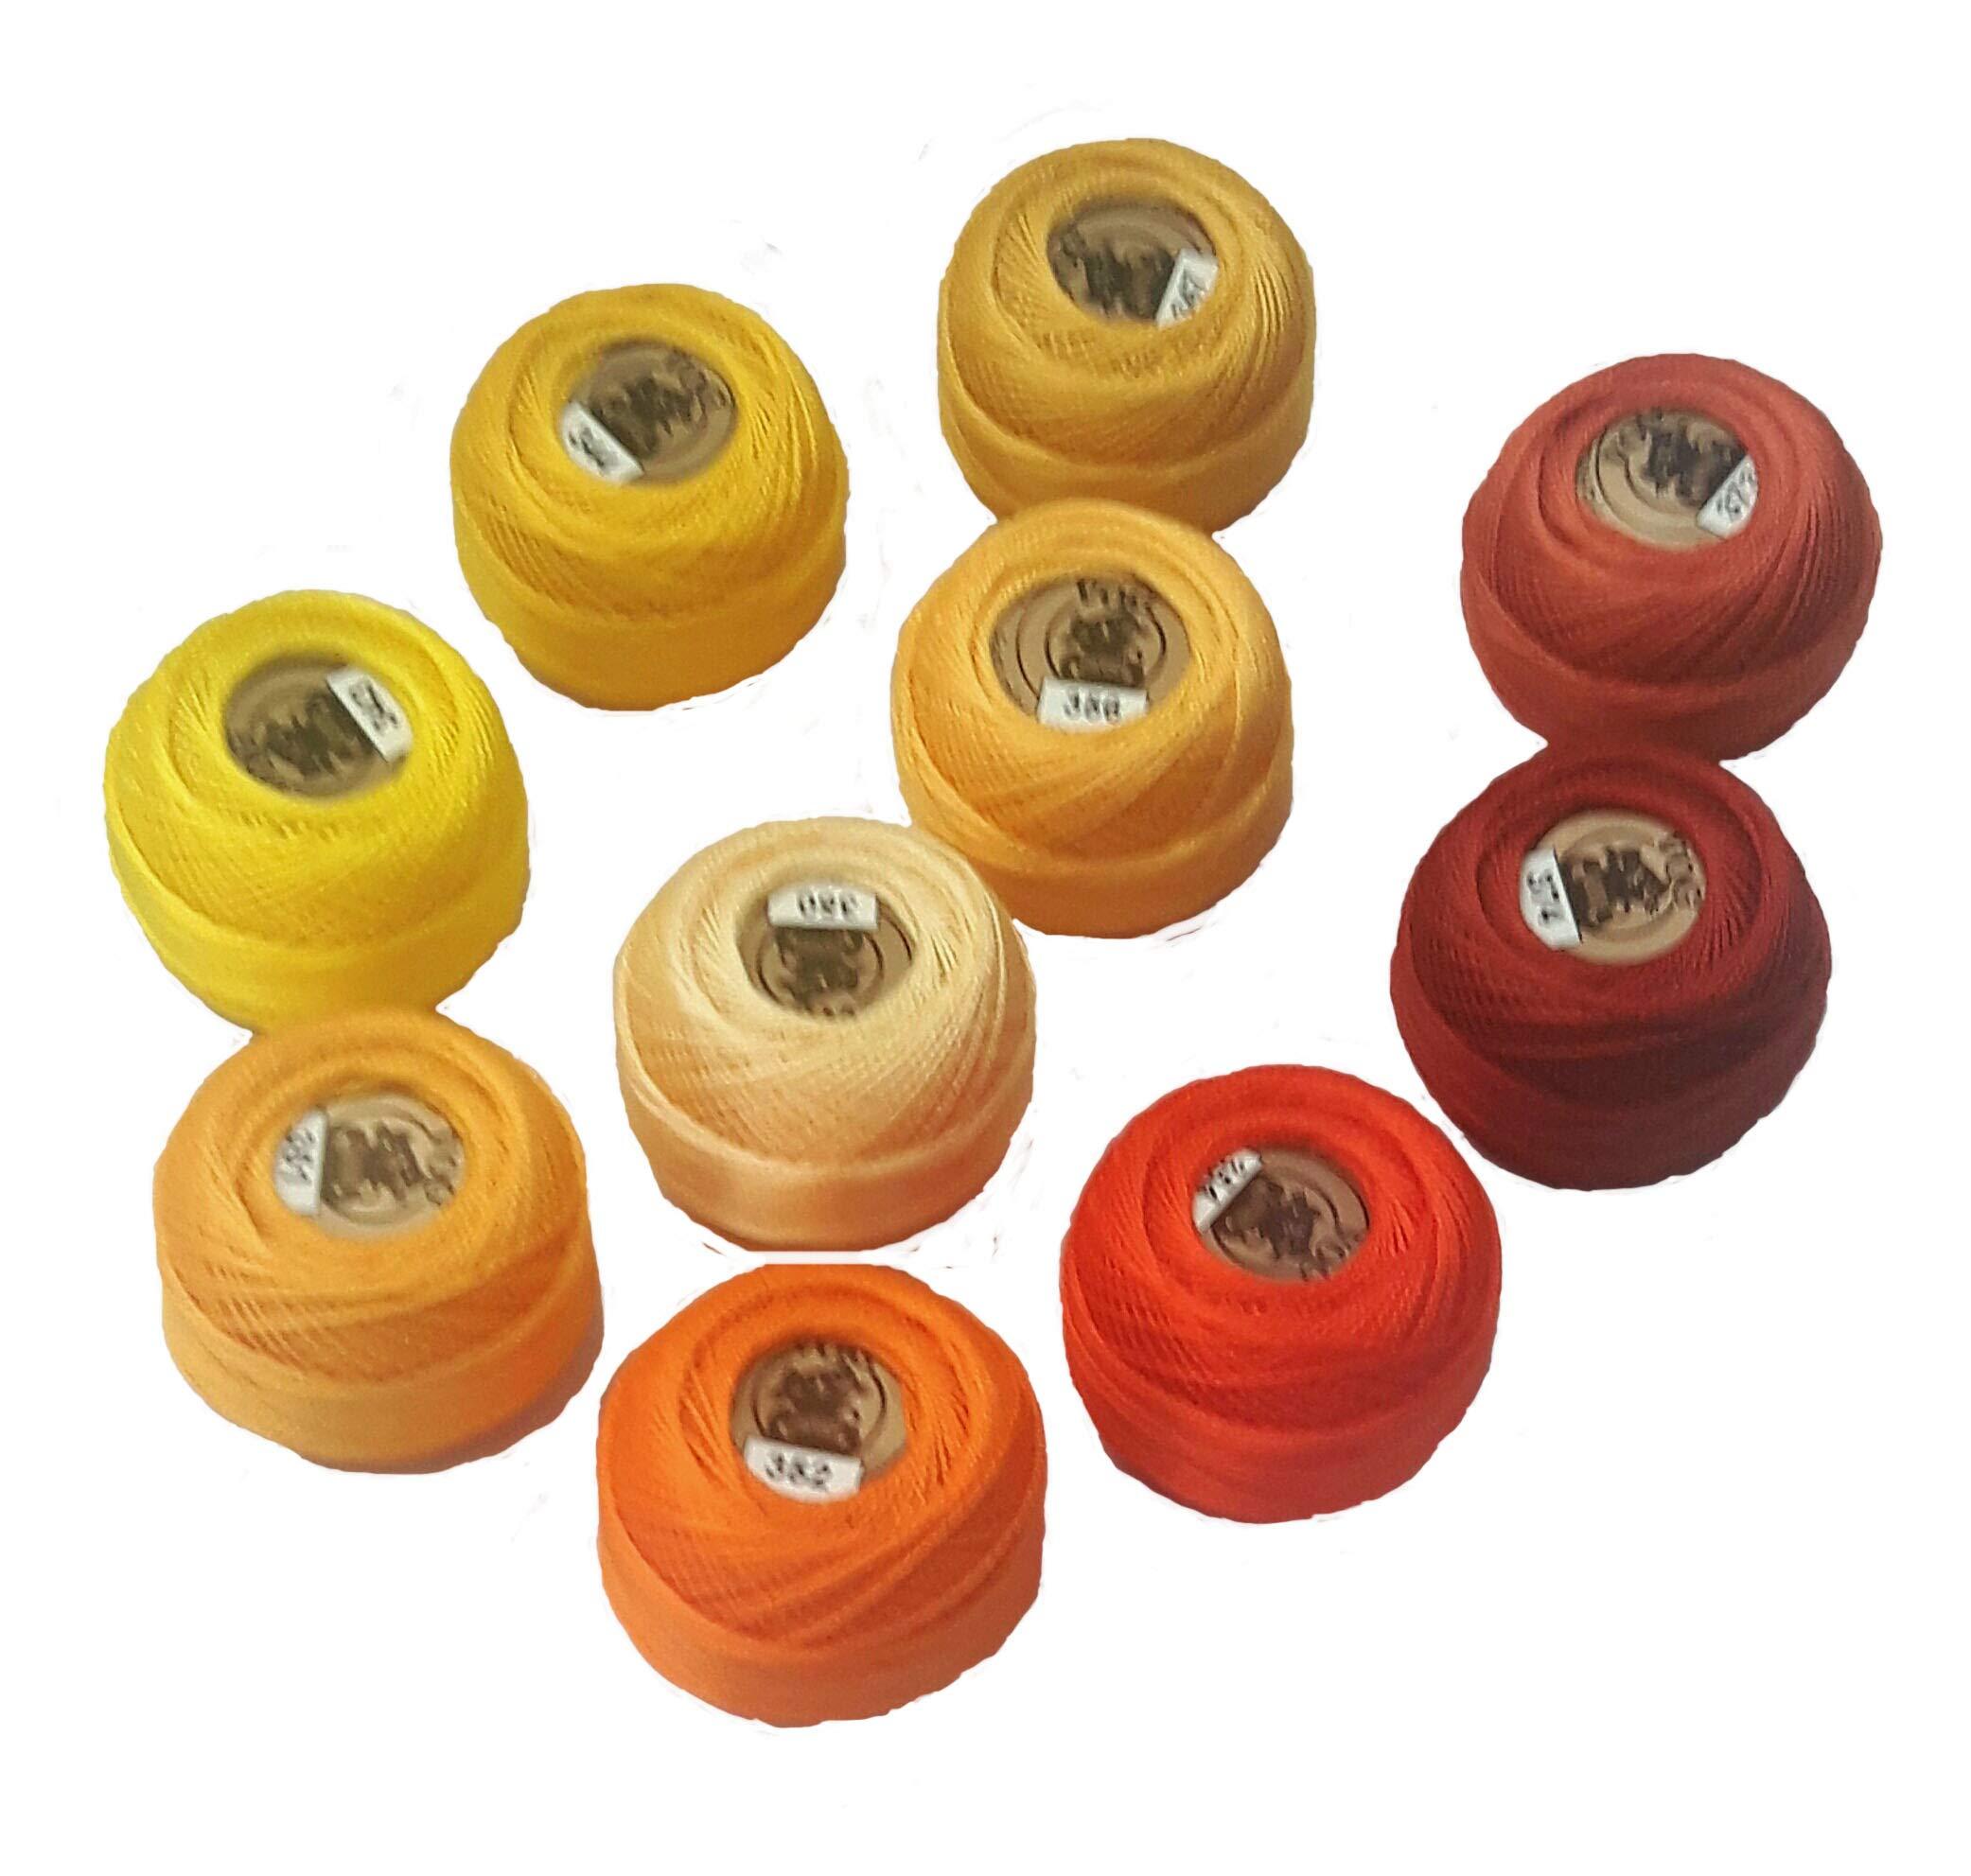 Vog Perle Cotton Size 8 Embroidery Threads - Set of 10 Balls (10gr Each) - Yellow & Orange Shades (Column No. 7) by Vog